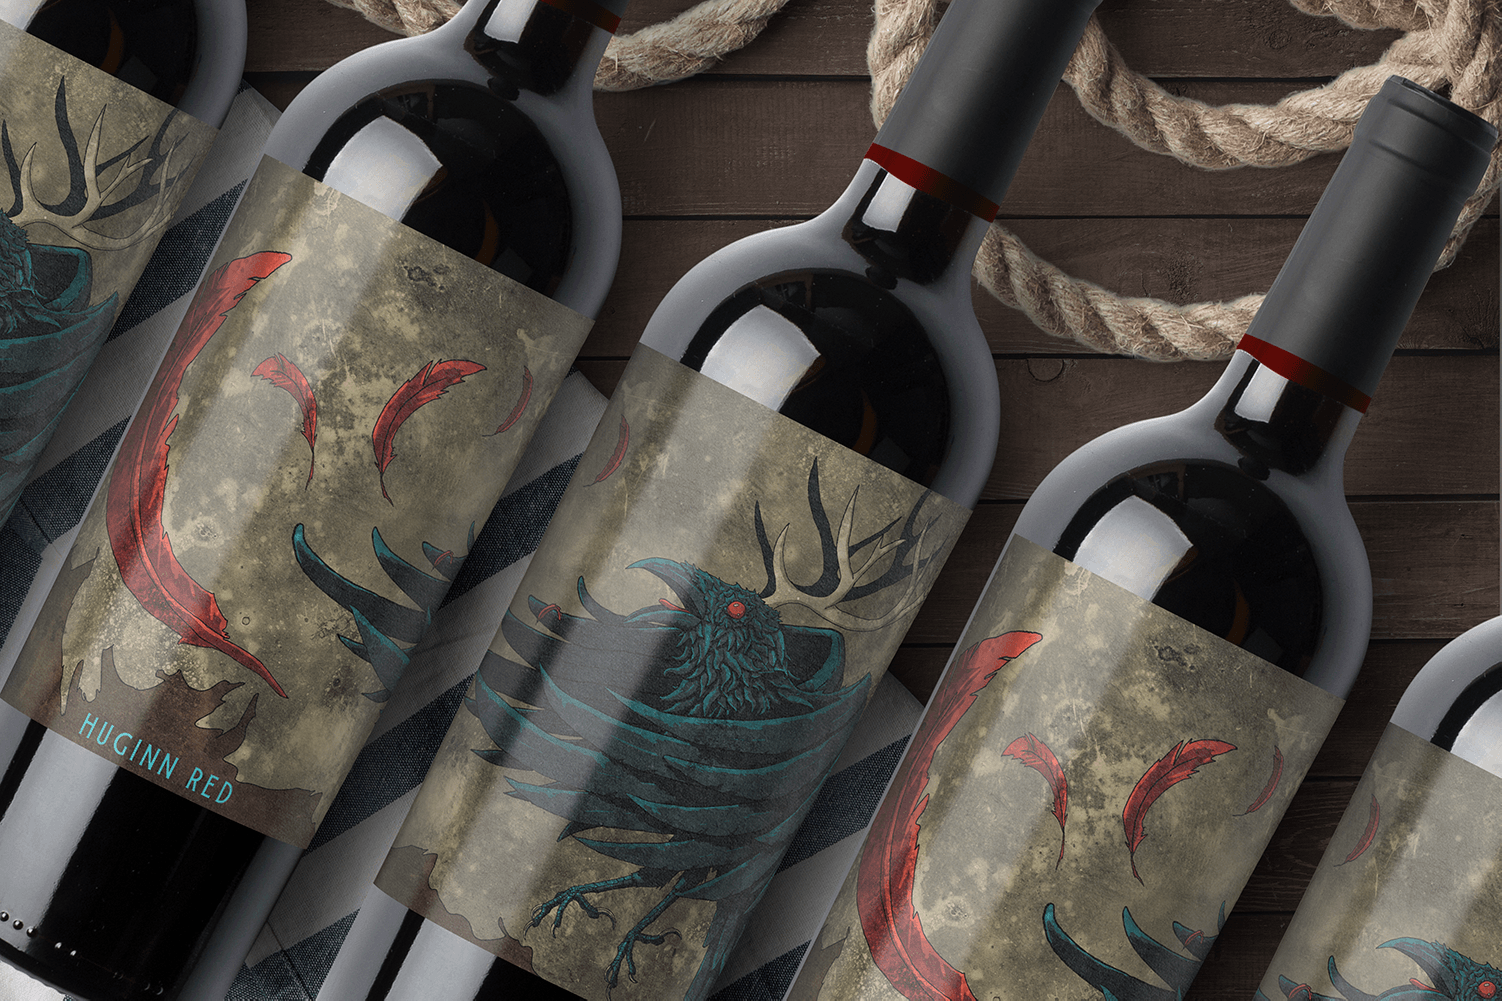 Huginn Red Wine-front-packaging-scene_mockup 7.png